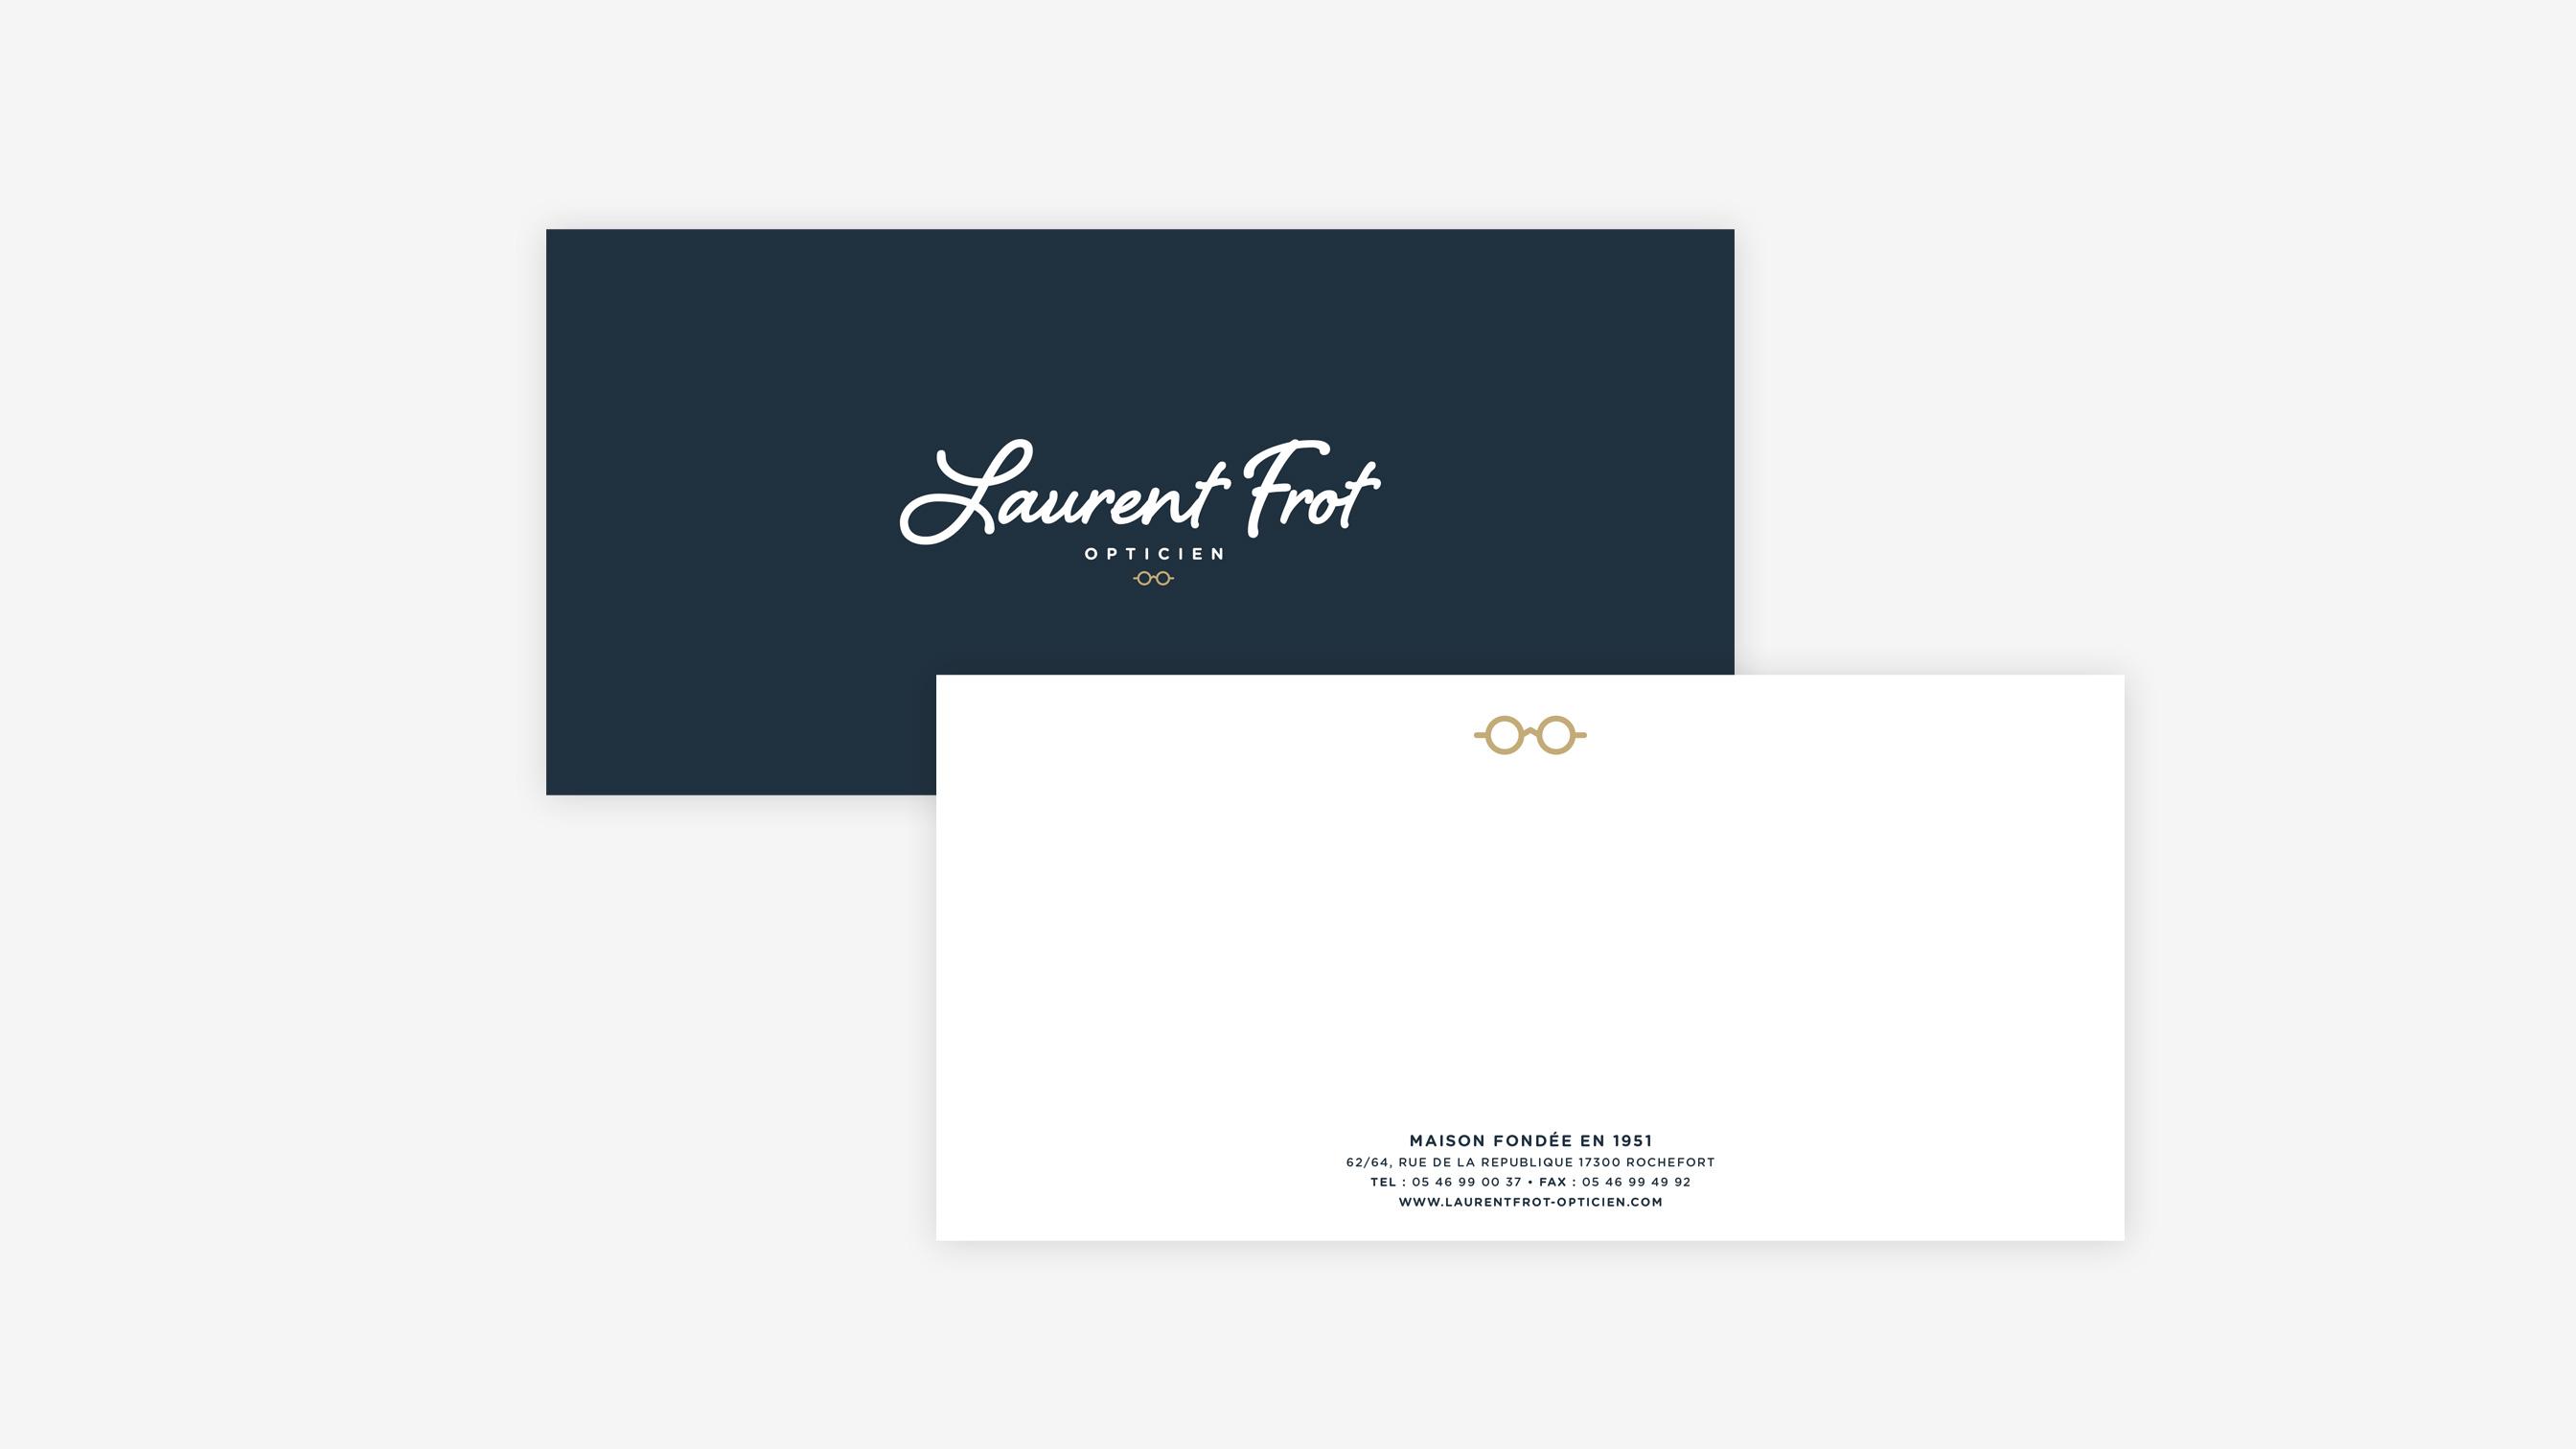 08-laurent-frot-opticien-pikteo-webdesign-graphic-design-freelance-paris-bruxelles-londres